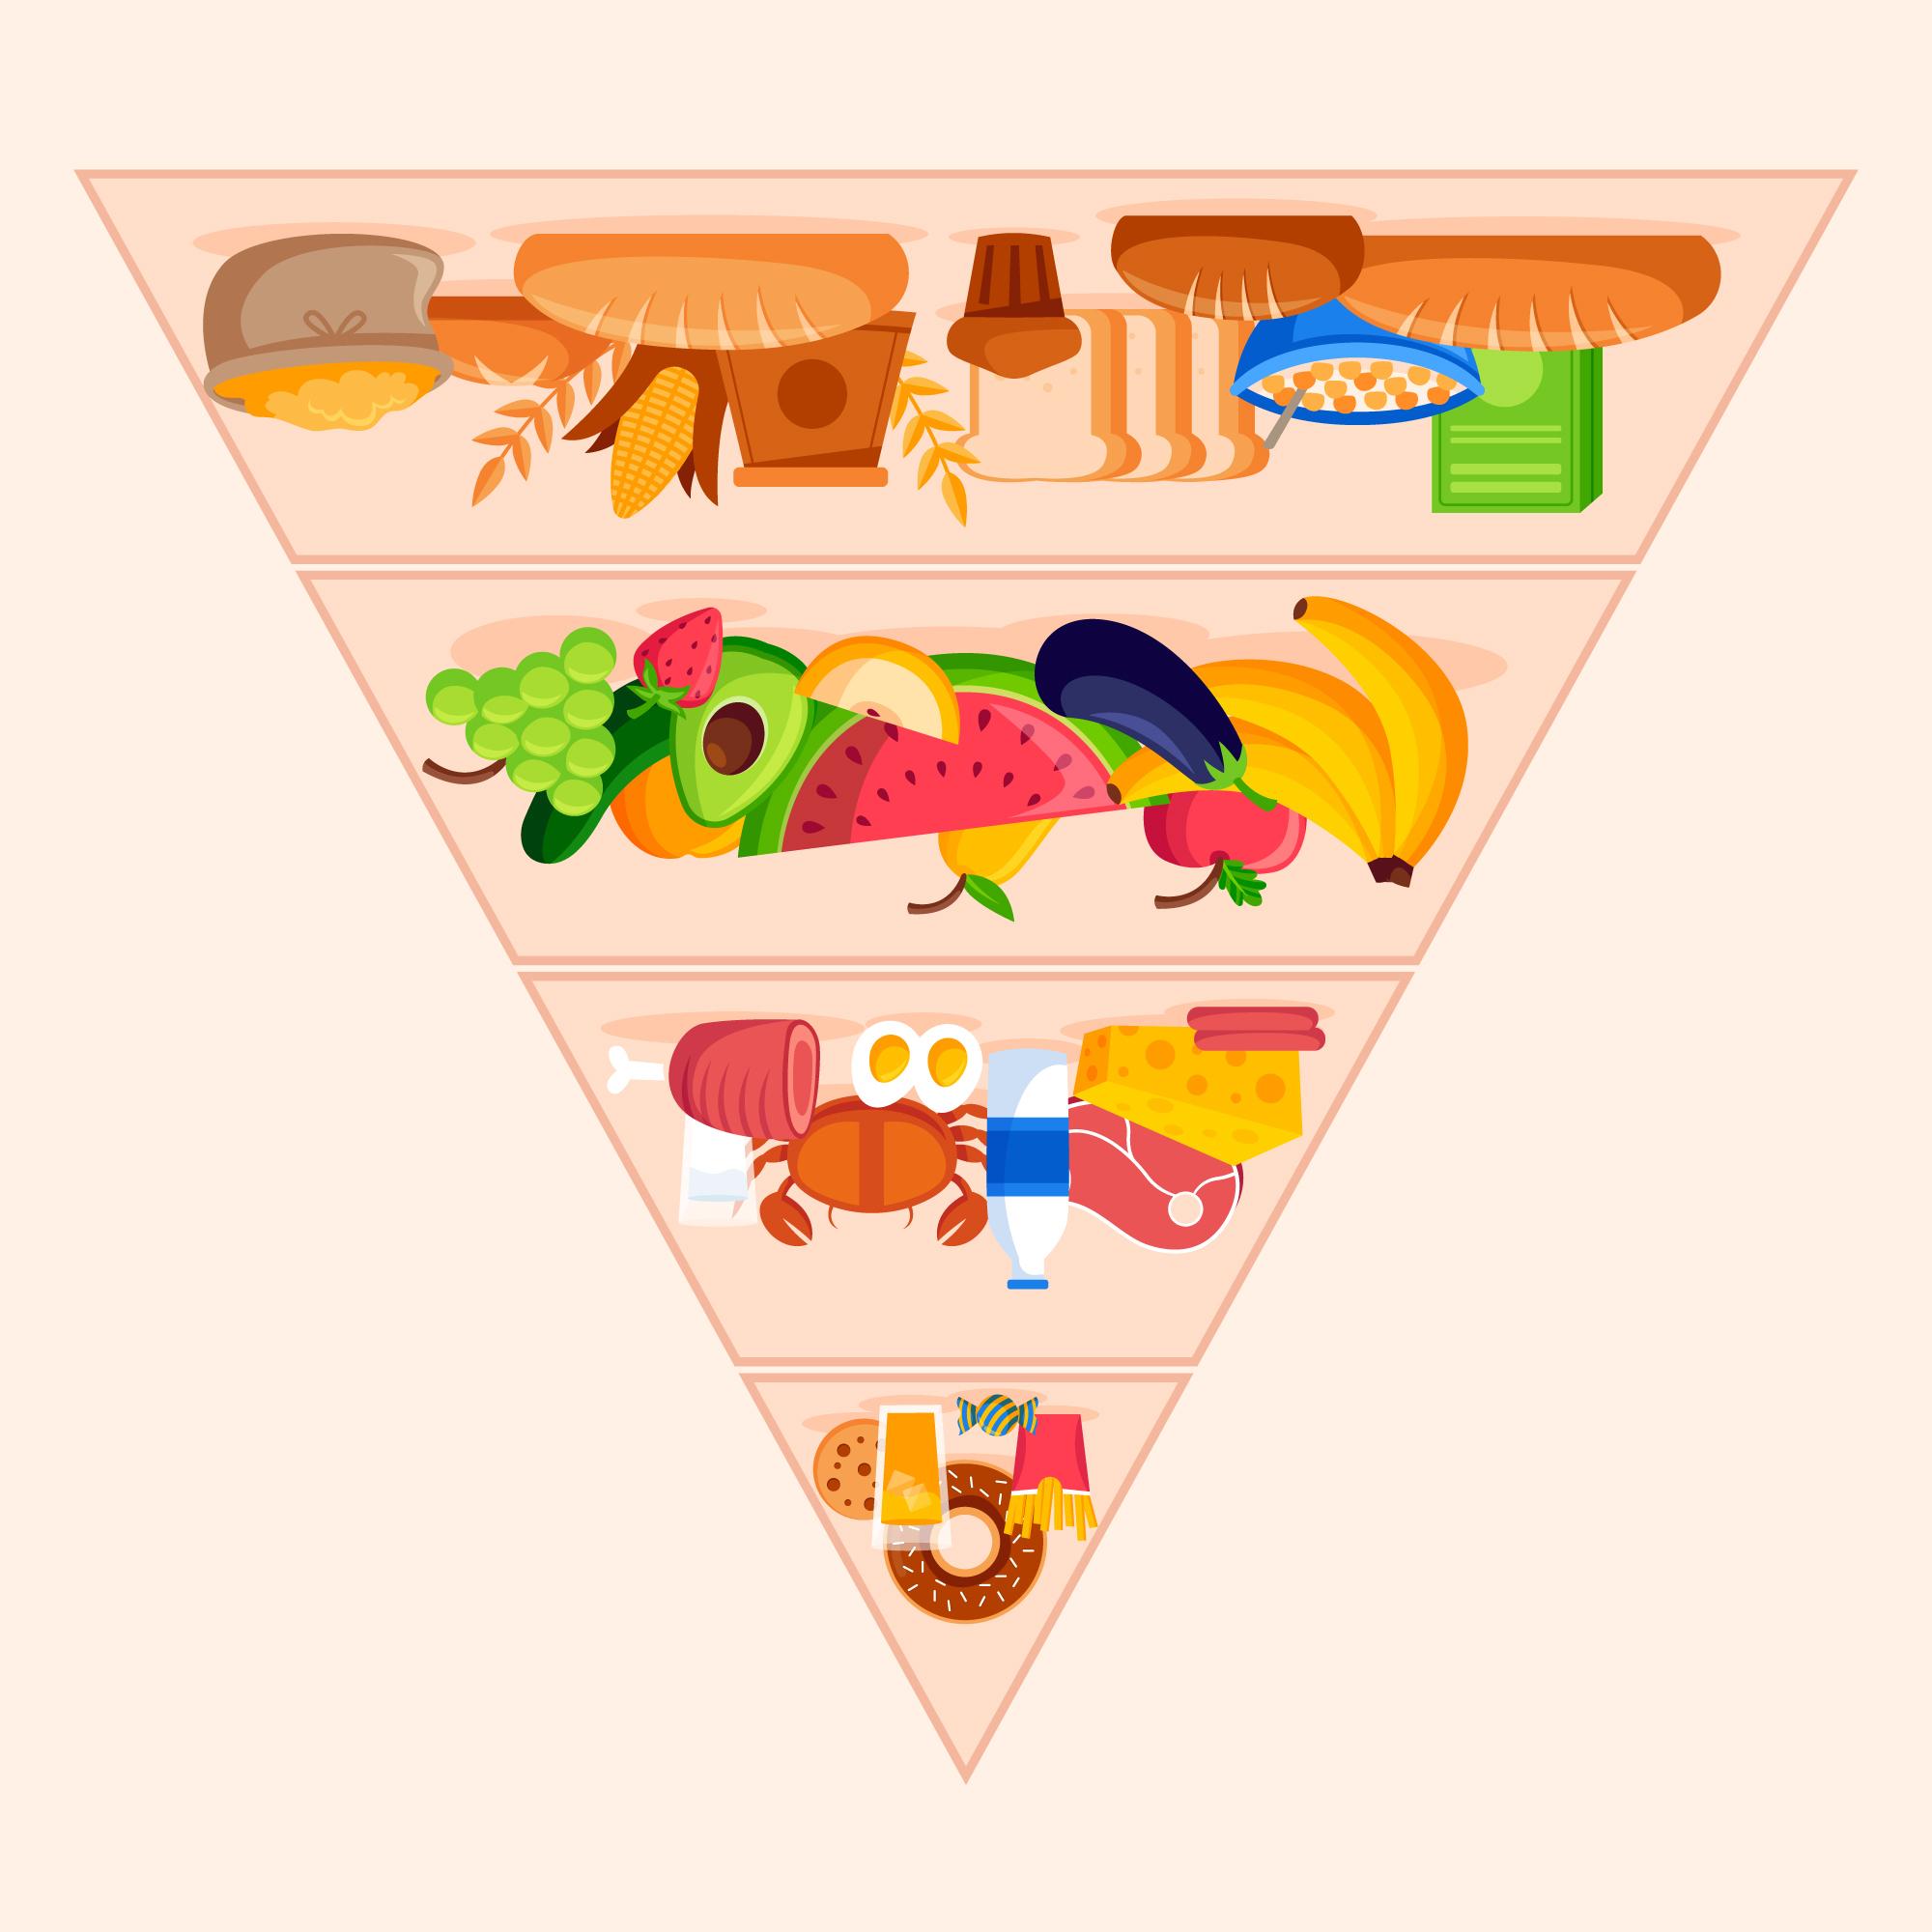 Food vector created by freepik - www.freepik.com upside down food pyramid